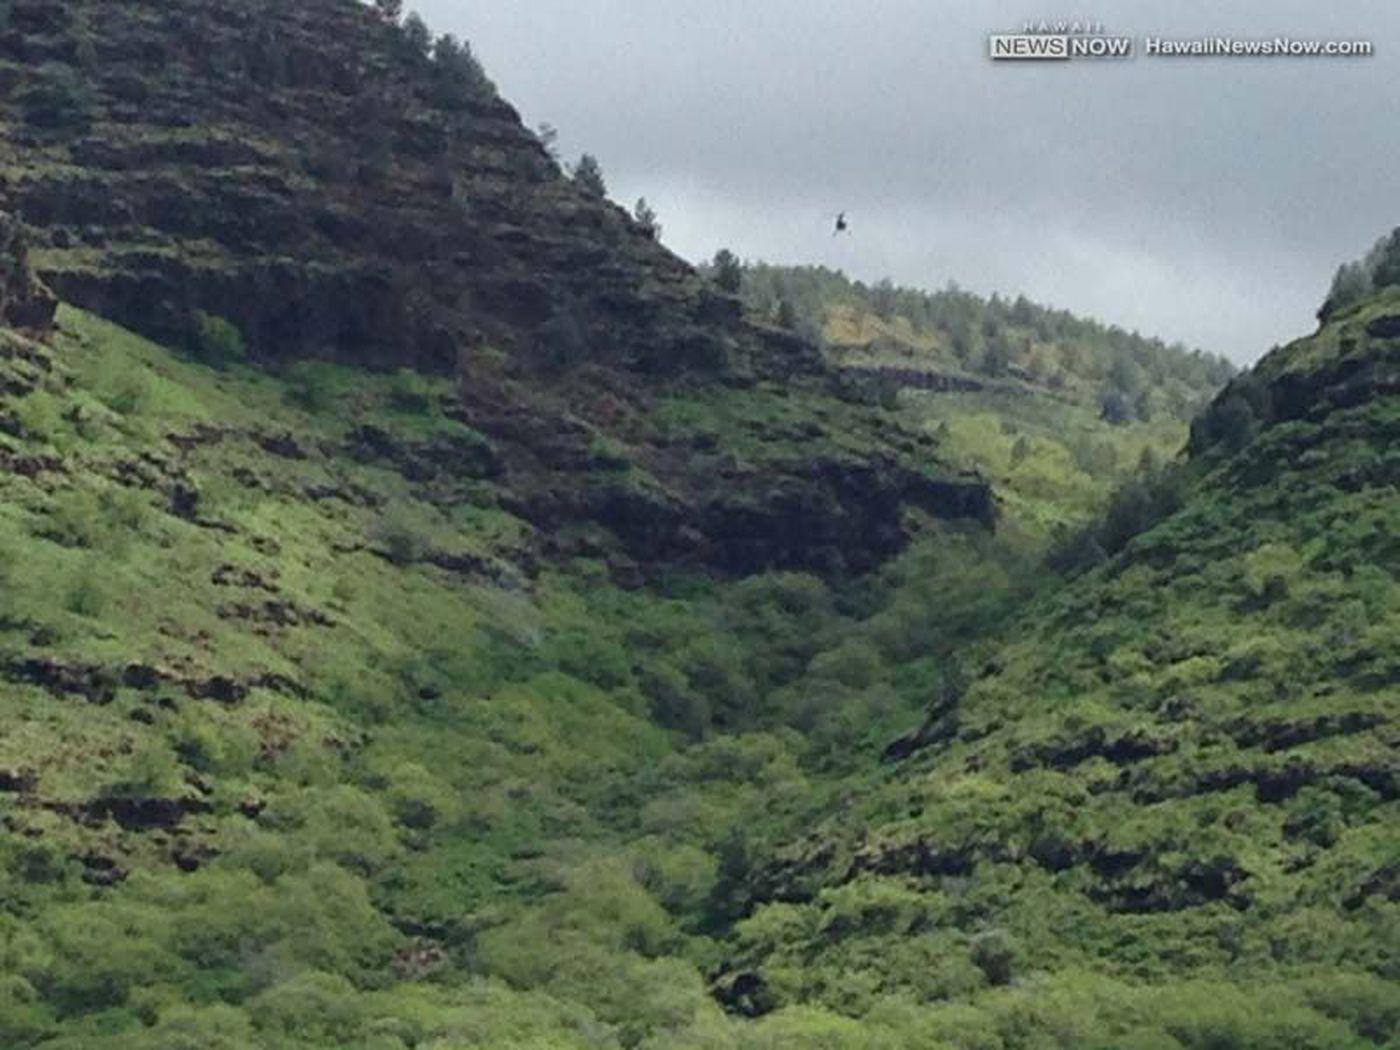 Ultralight aircraft crash kills 2 people on Kauai